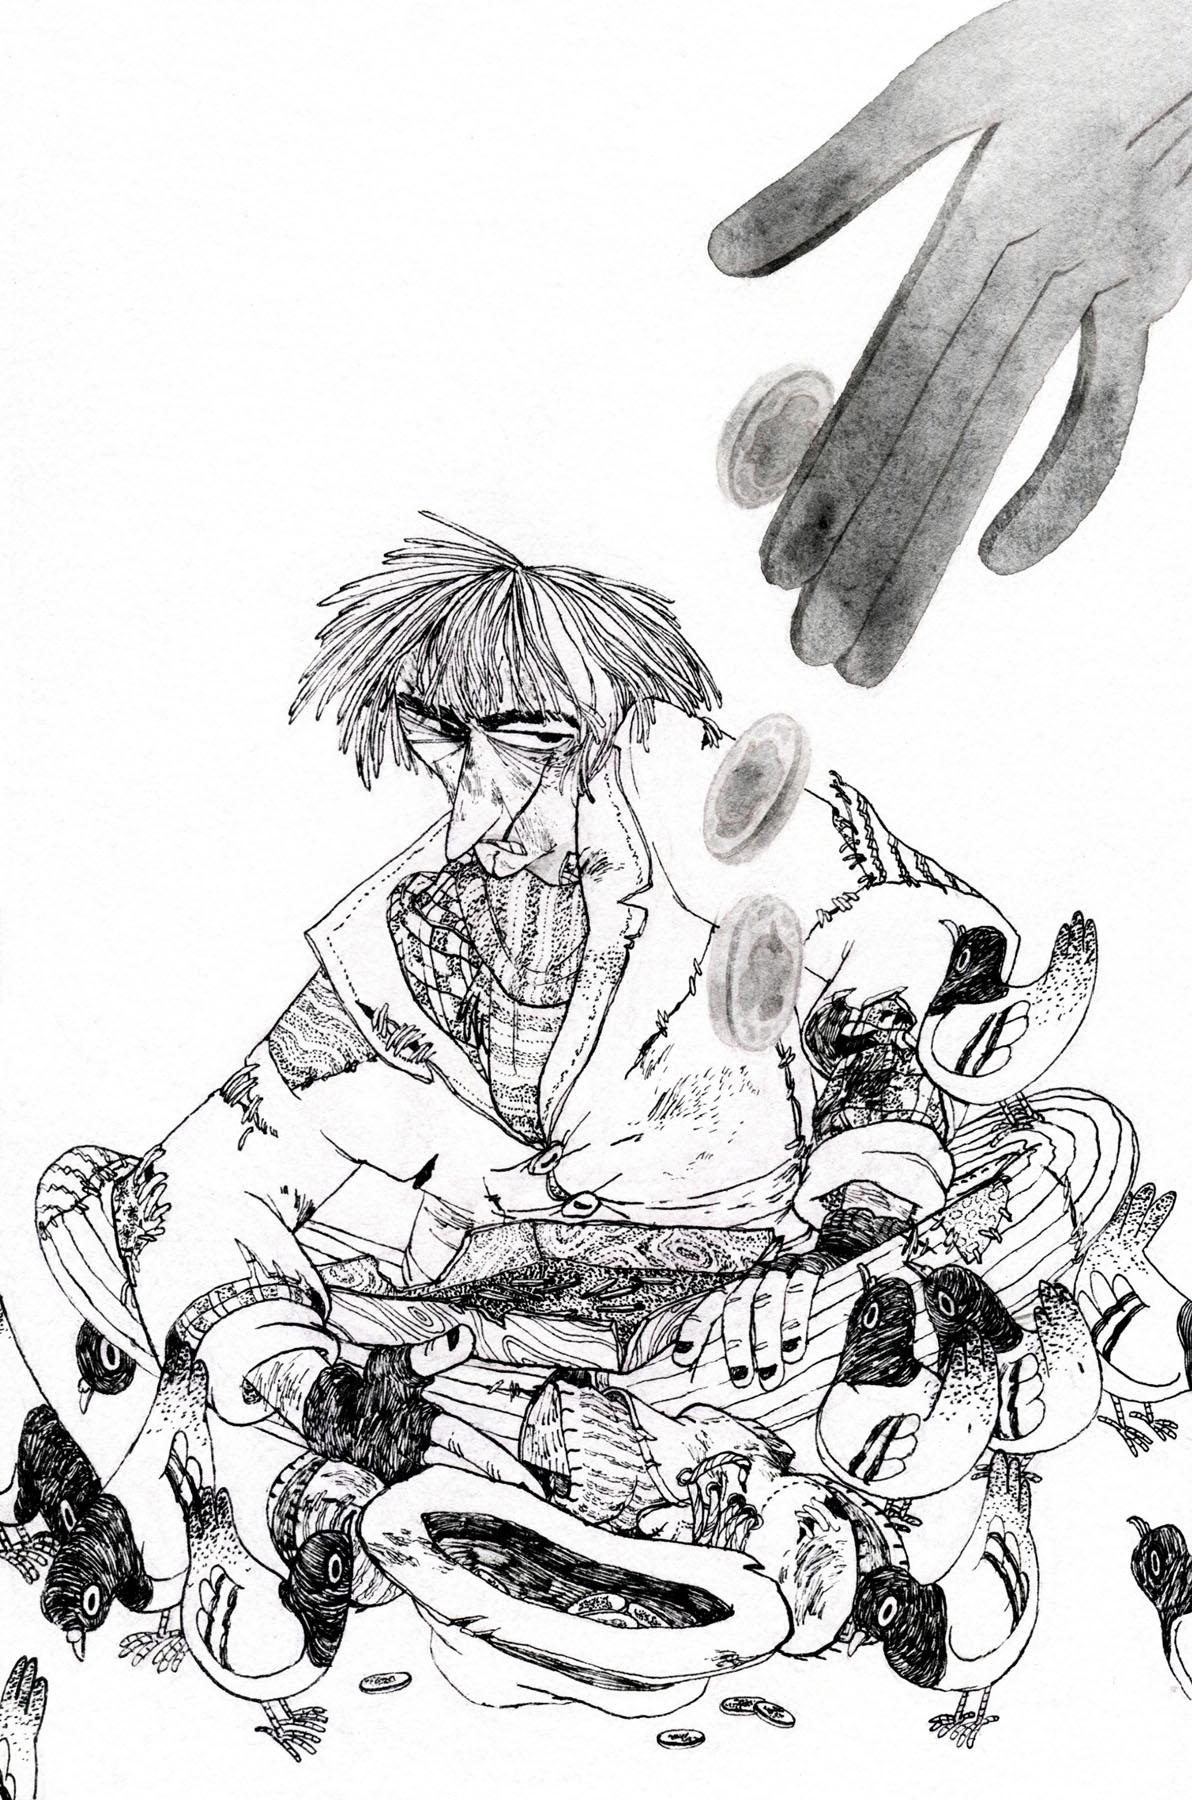 Zuzana Cupova's entry to the Book Illustration Competition. © Zuzana Cupova 2018